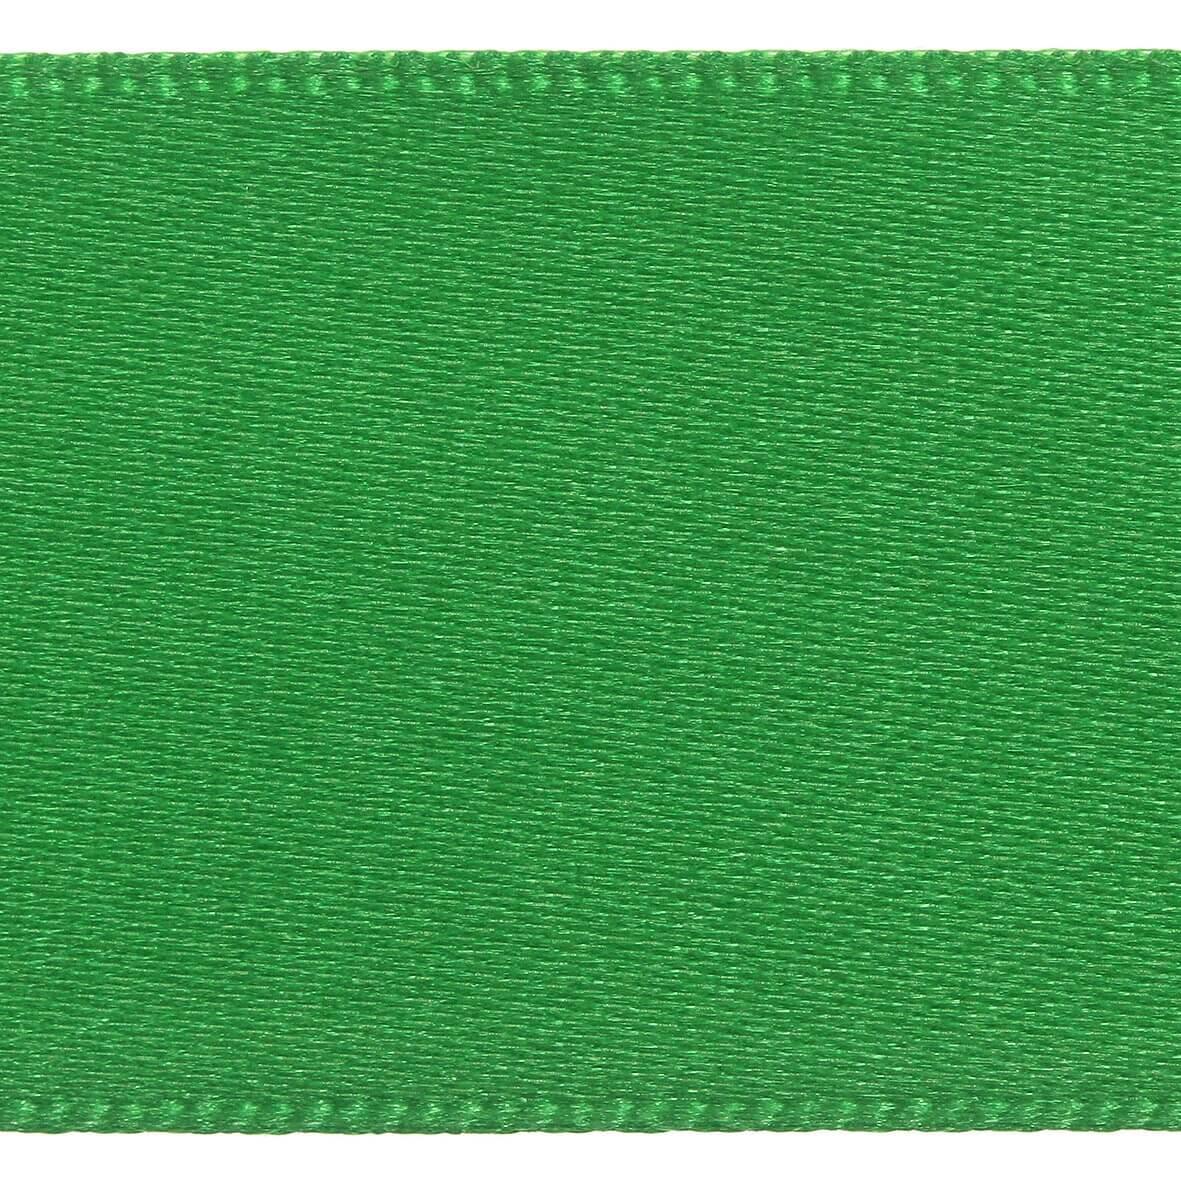 10mm Berisfords Satin Ribbon - Emerald Colour 23